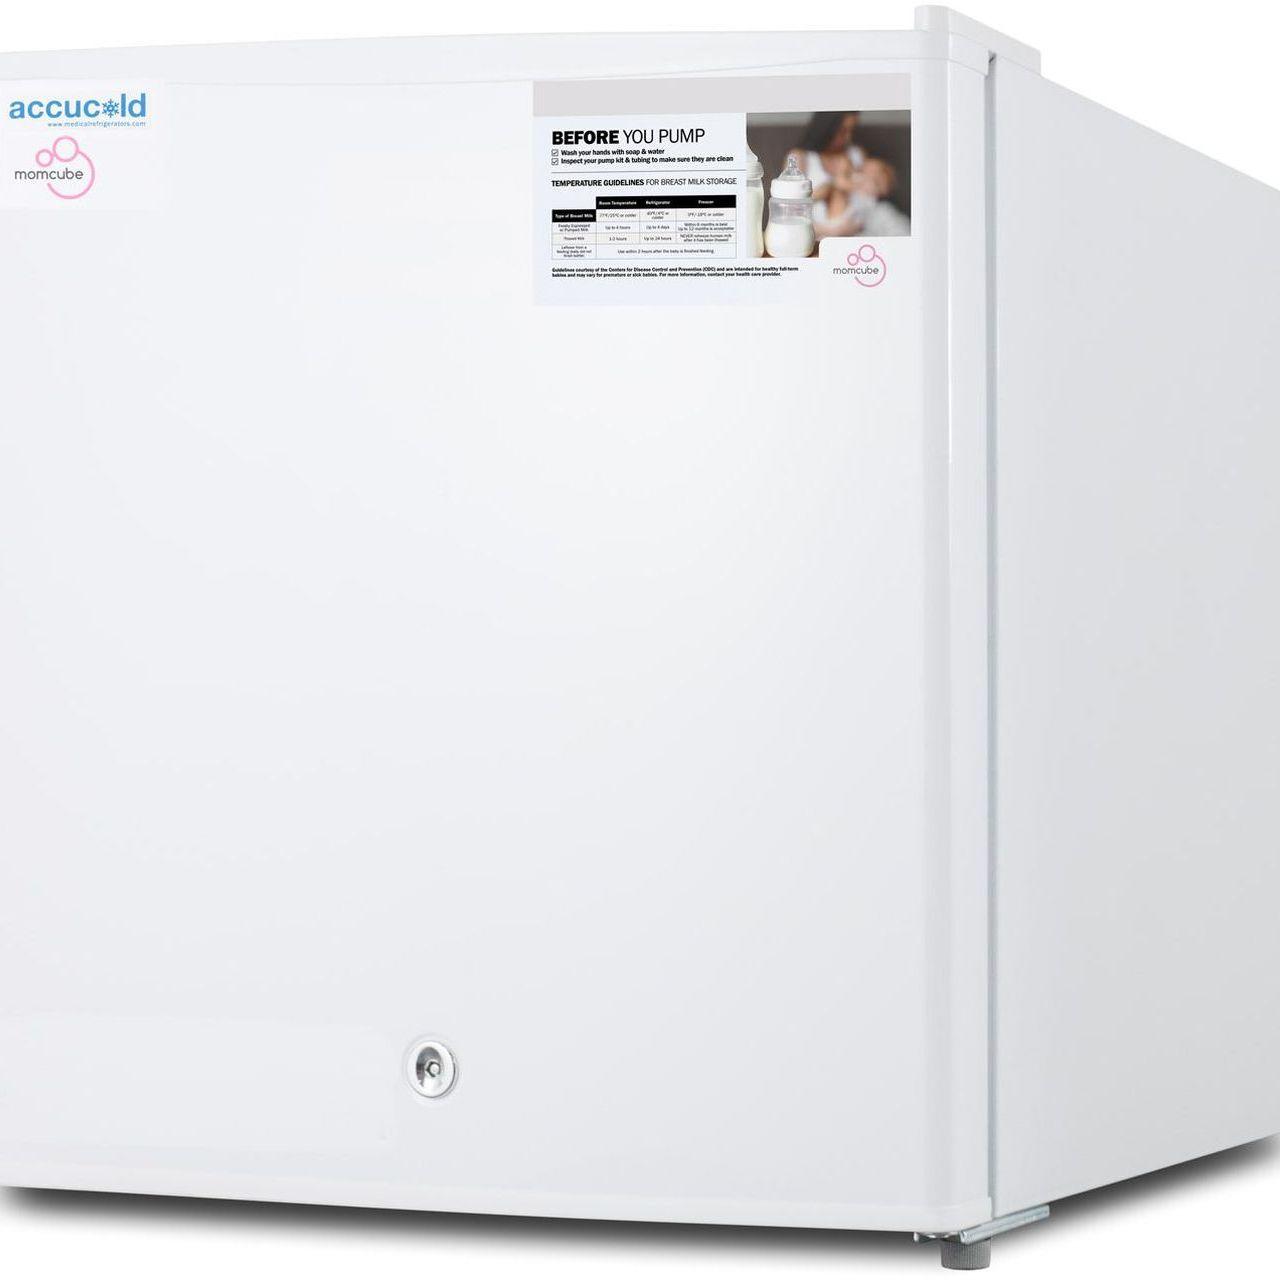 Summit FS24LMC 1.4 Cu Ft Countertop MOMCUBE Breast Milk Freezer